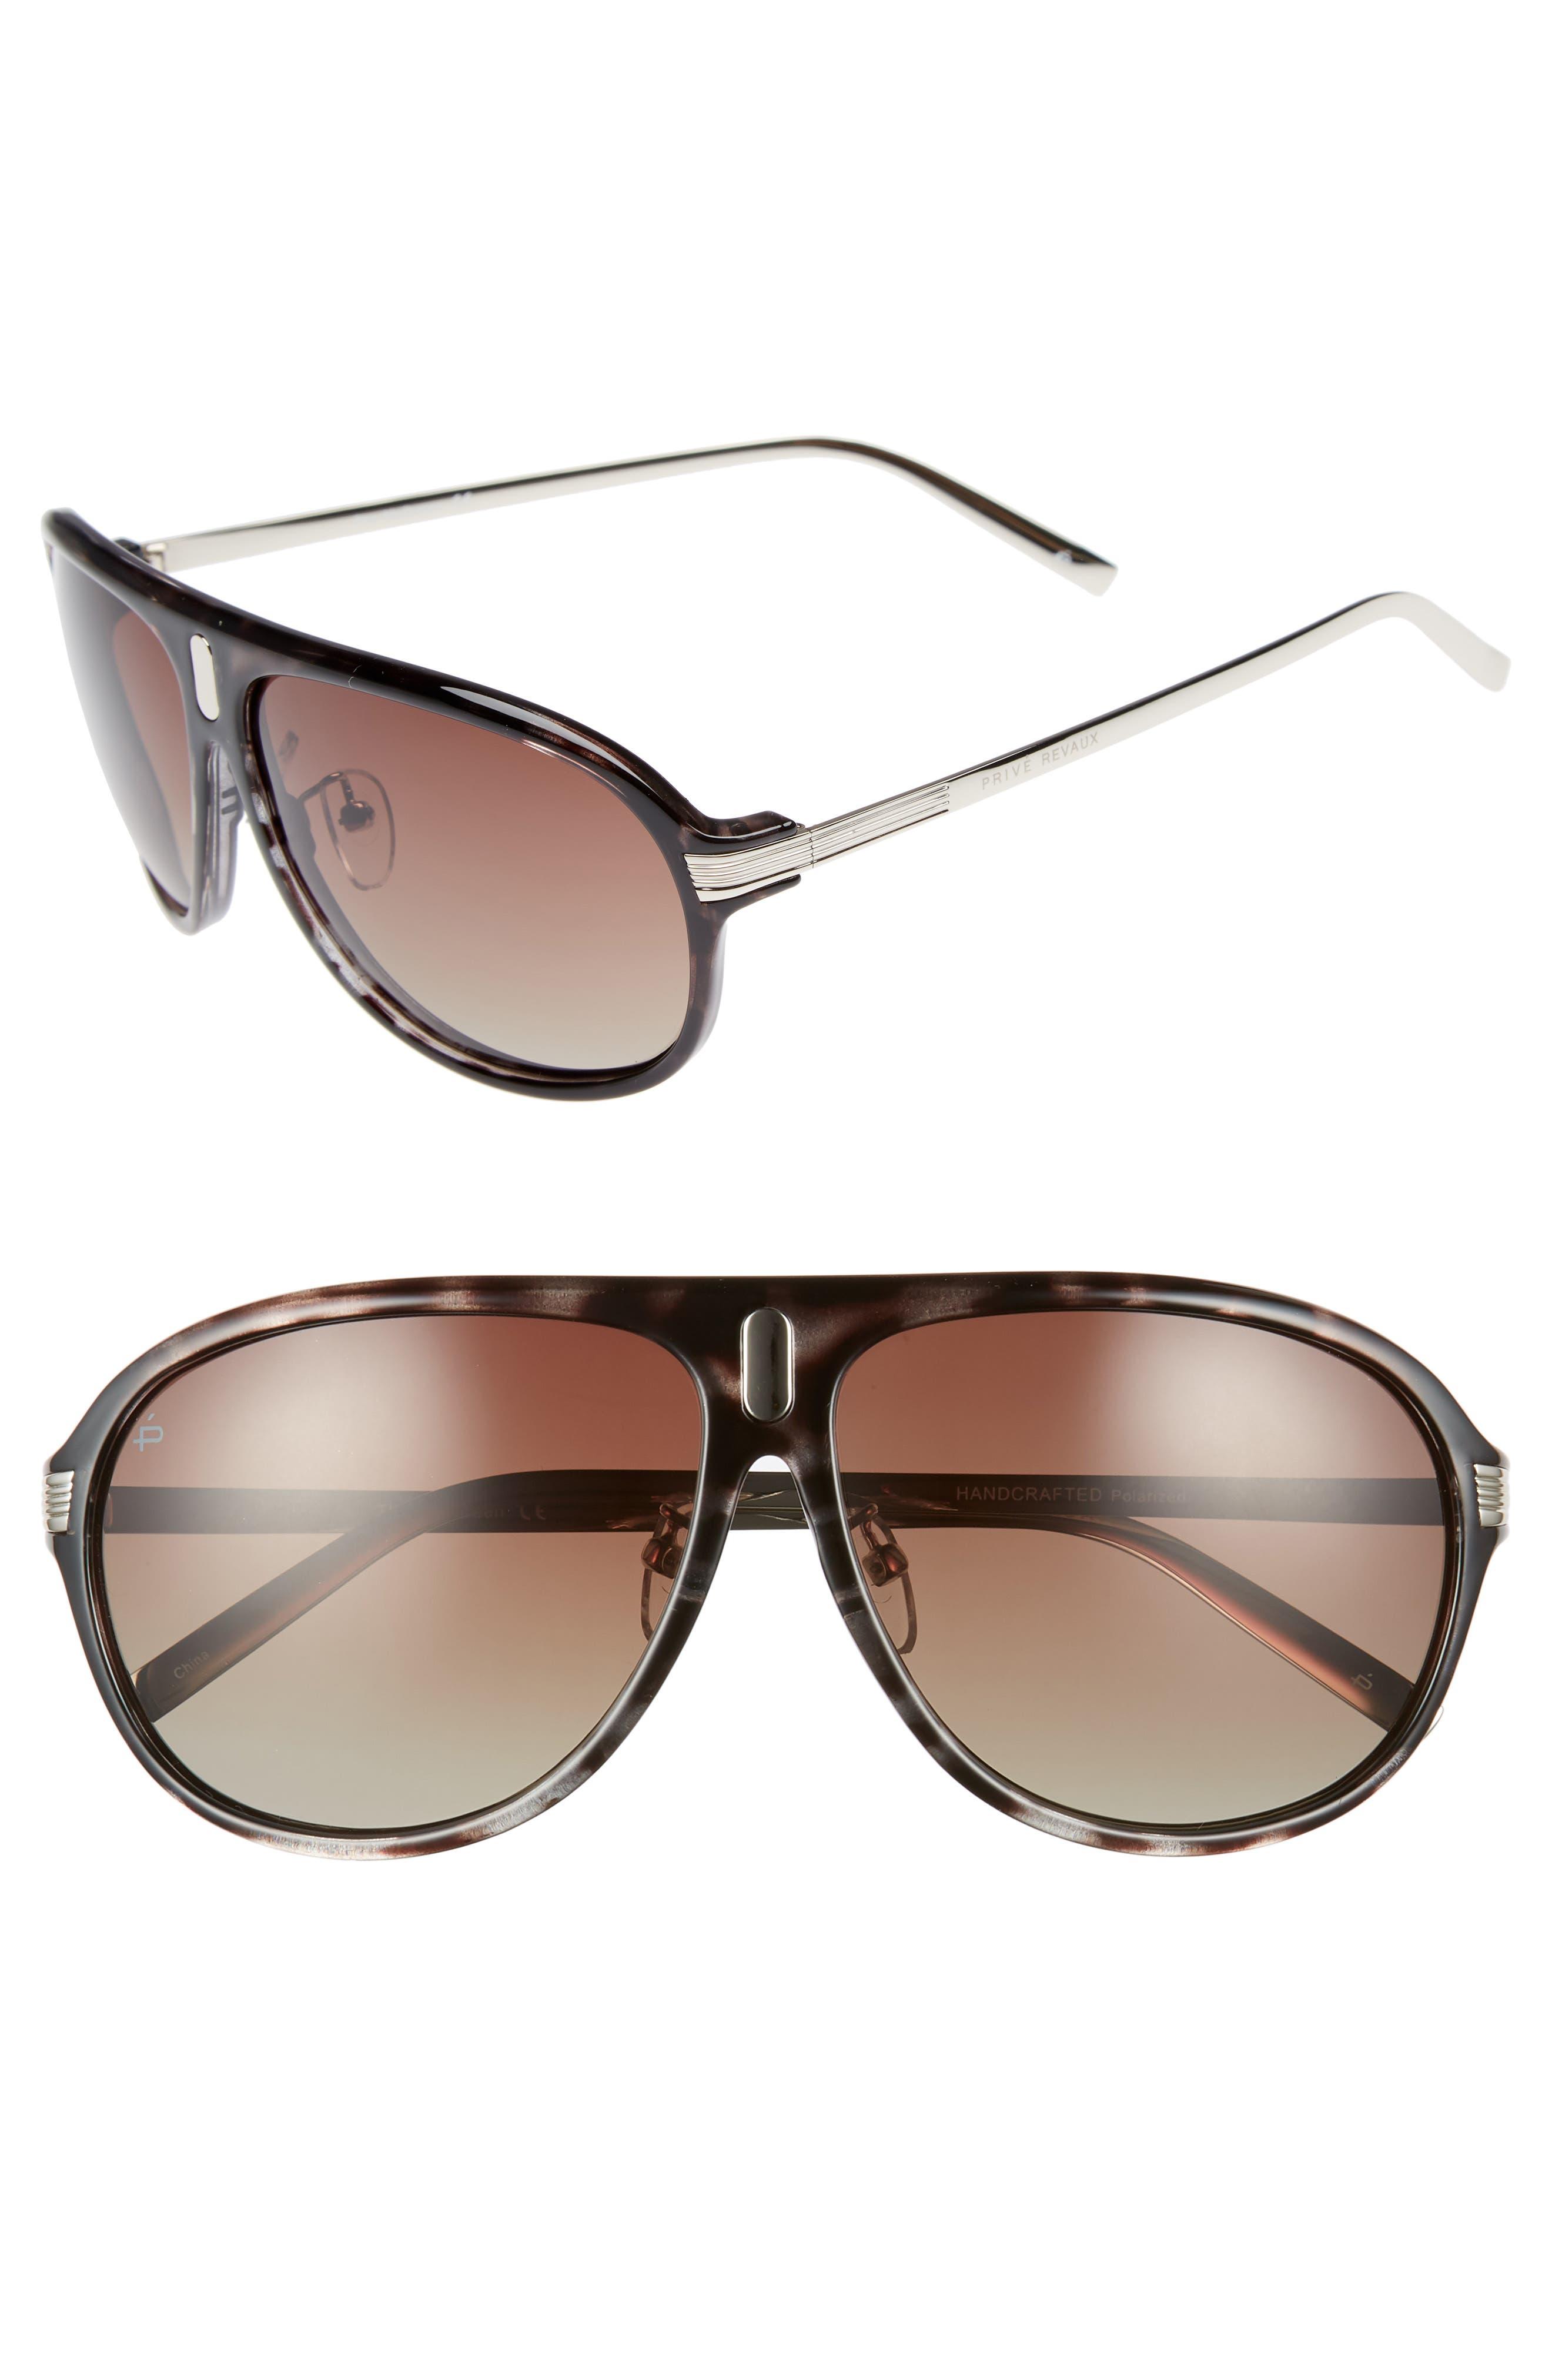 Privé Revaux The McQueen 62mm Polarized Aviator Sunglasses,                         Main,                         color, Grey